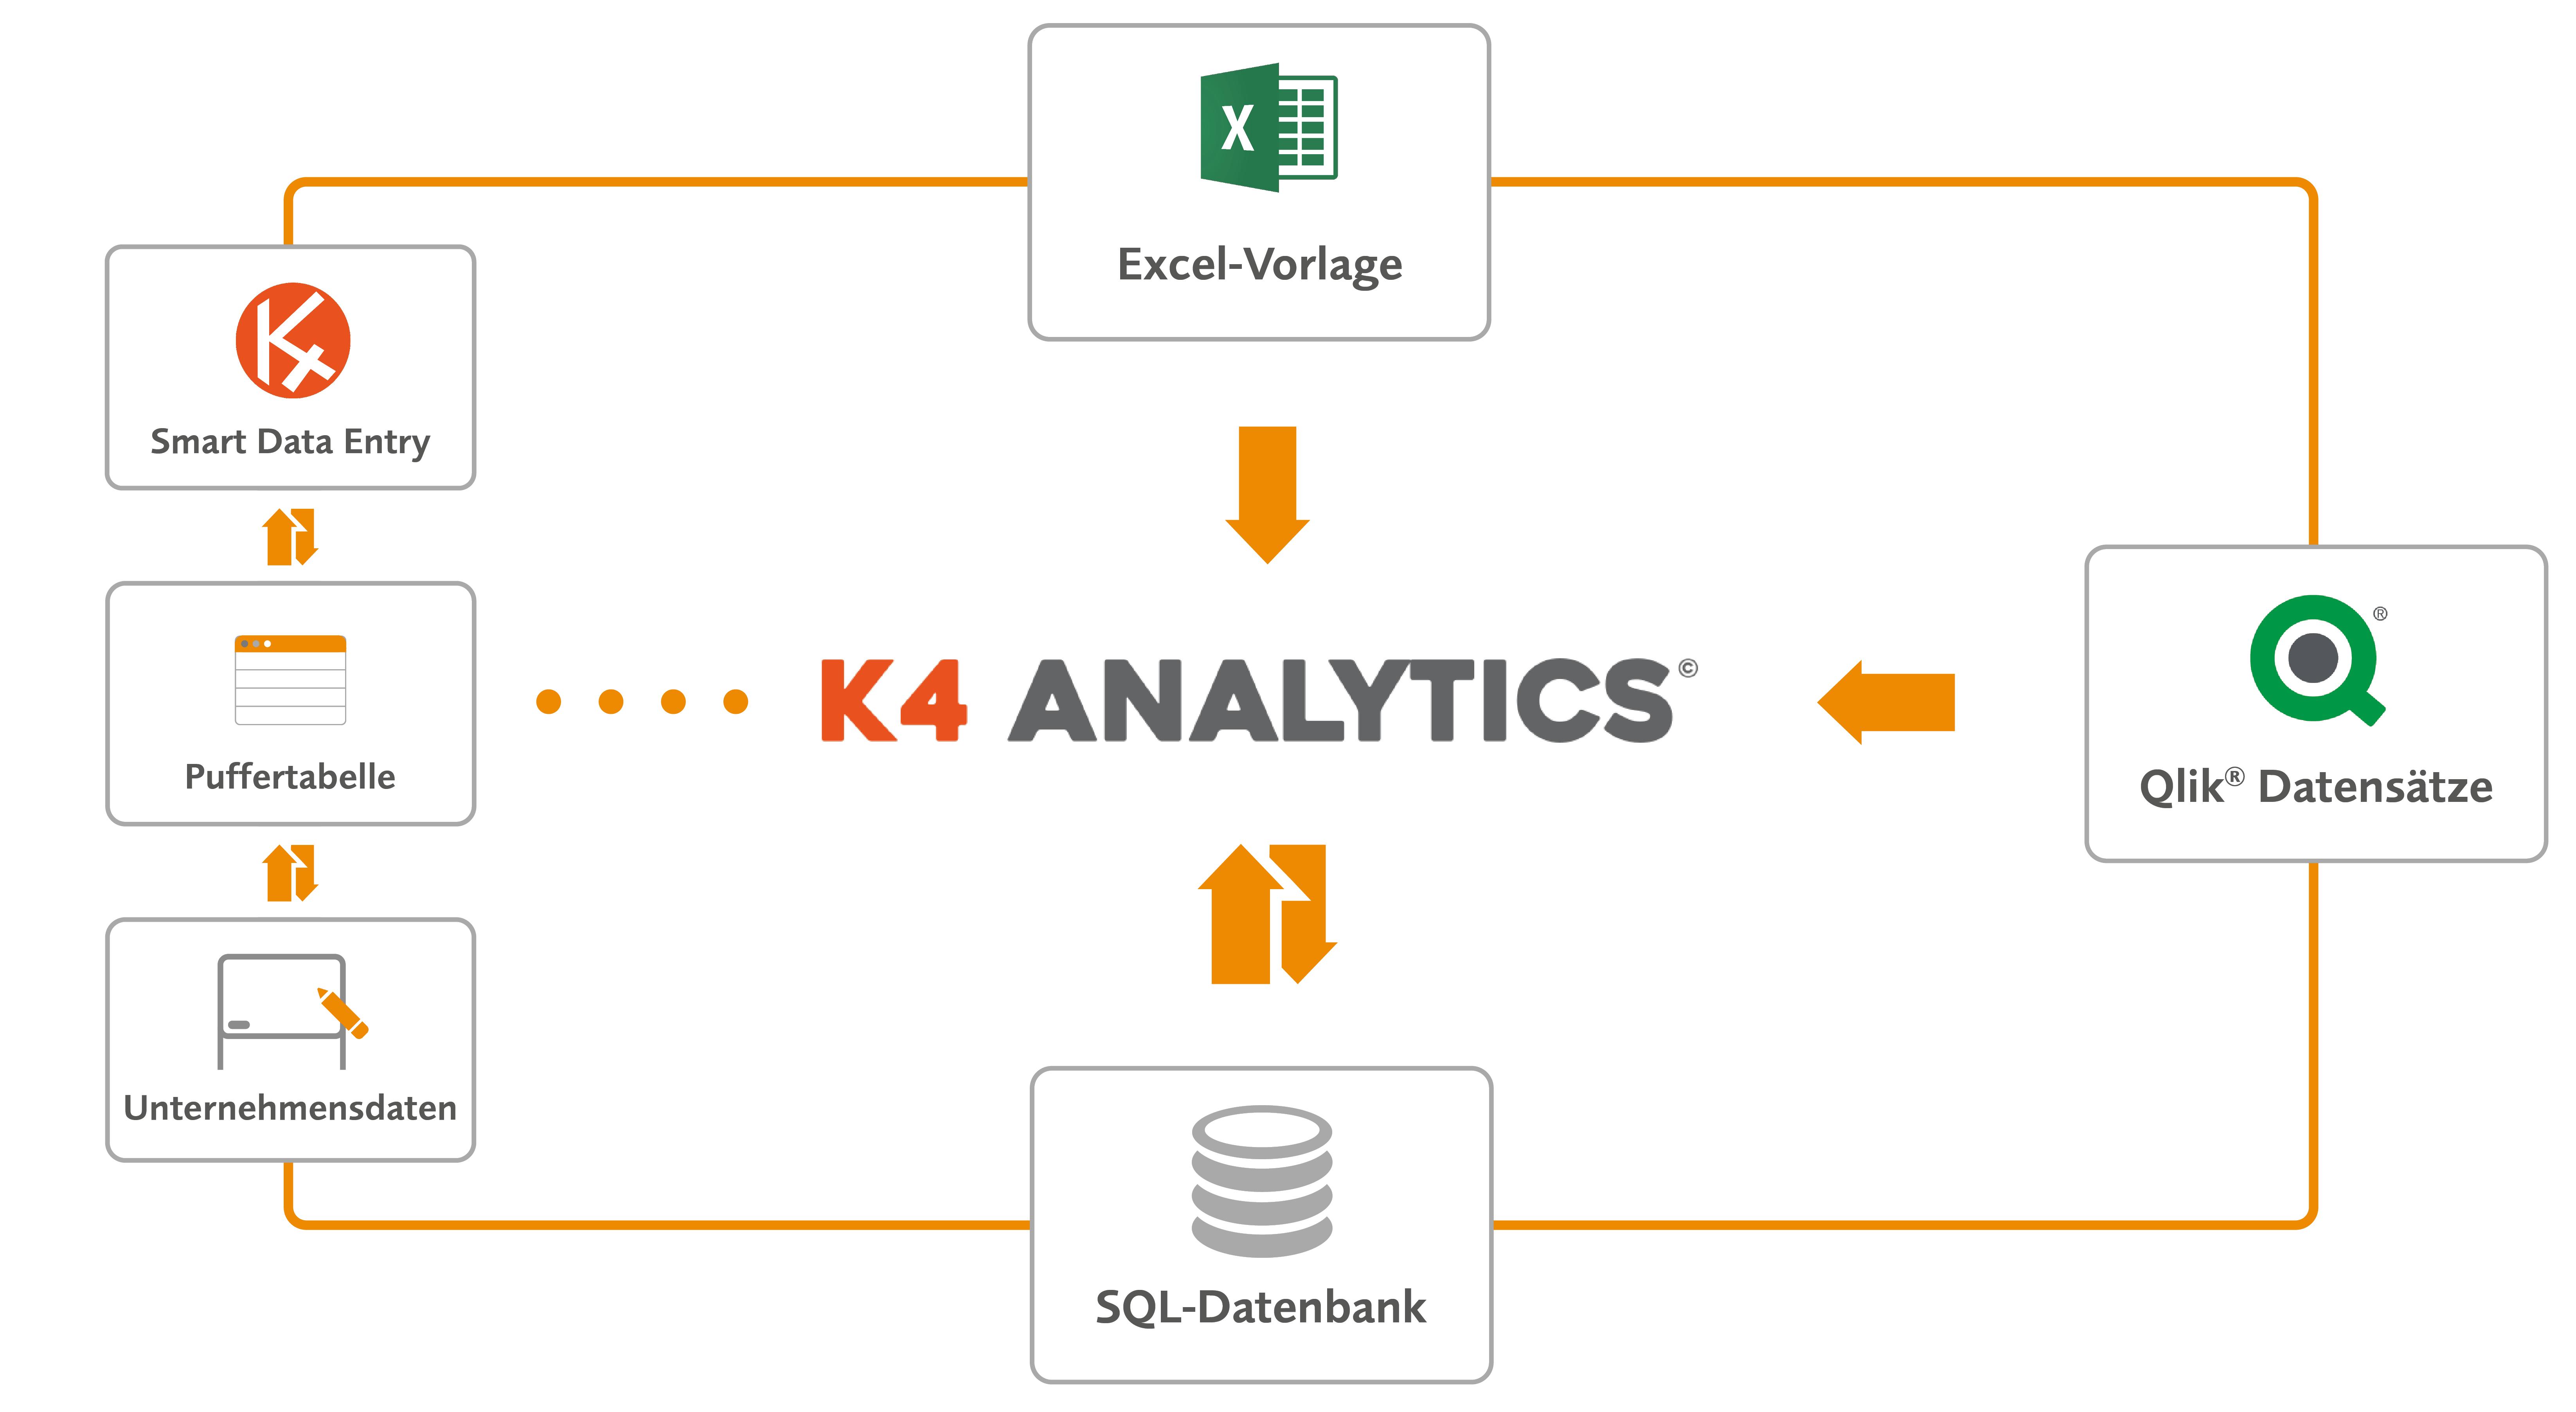 K4 Analytics Datenintegration